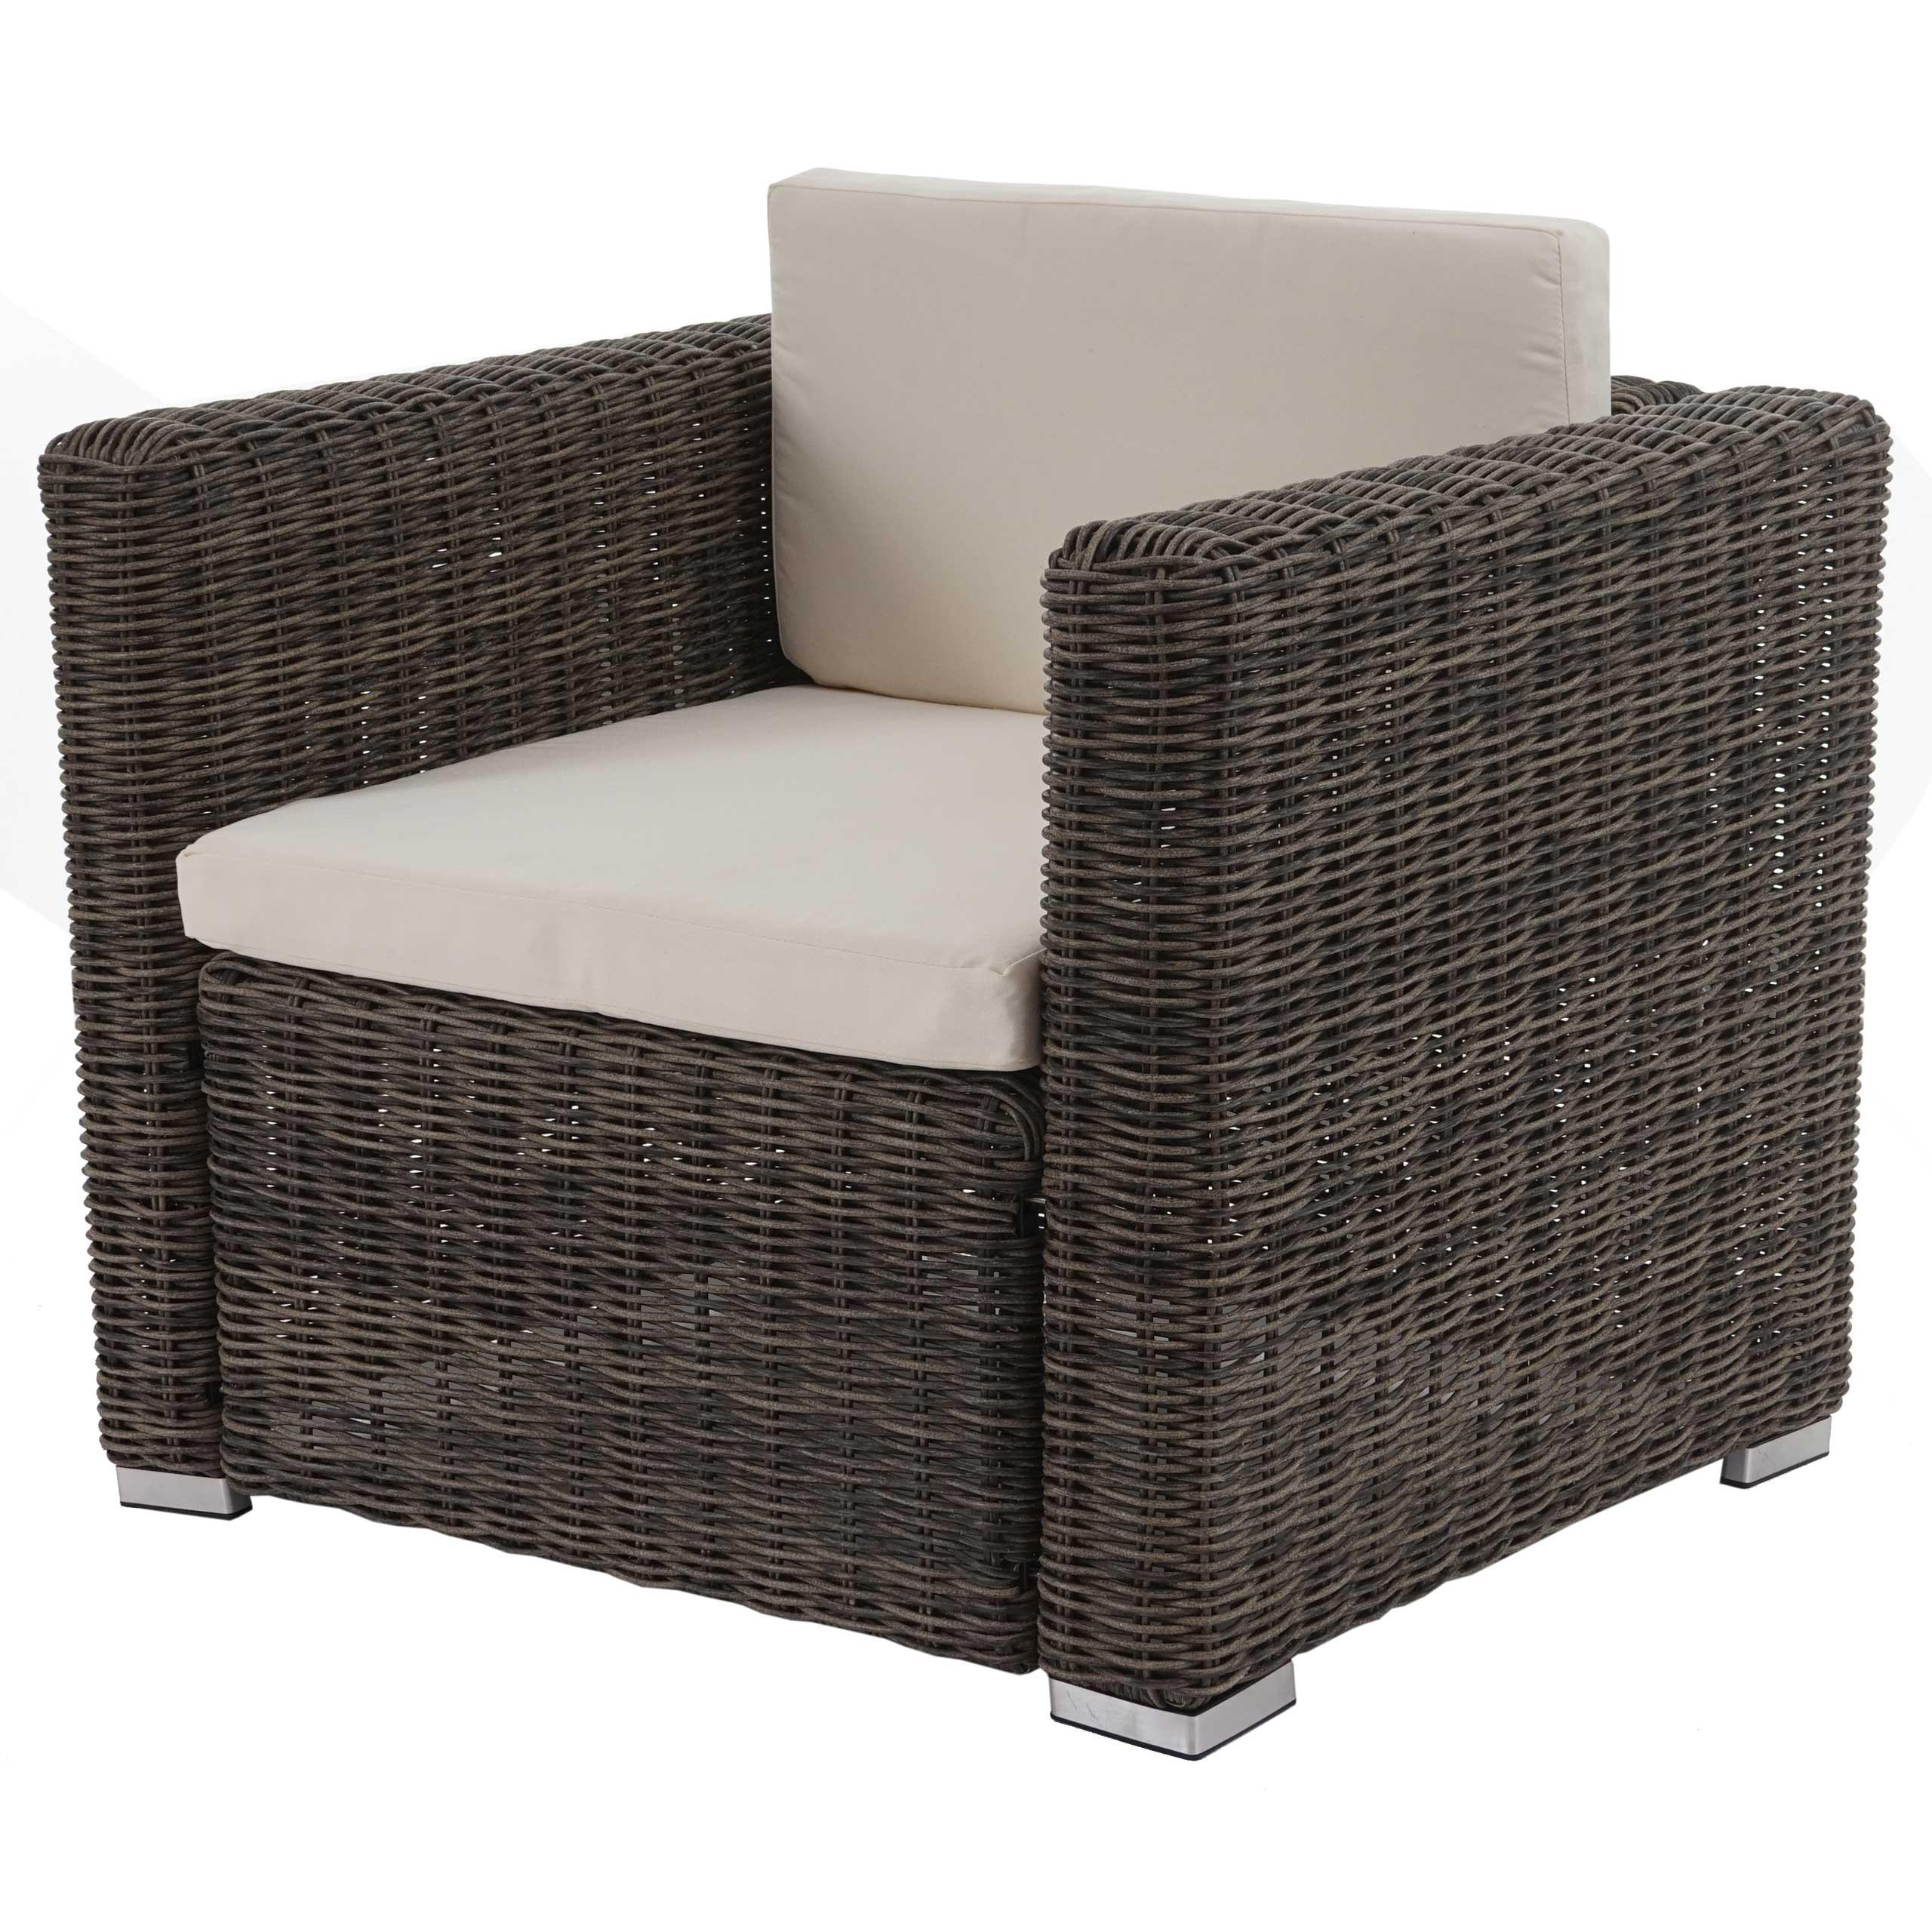 Full Size of Polyrattan Garden Sofa Set 2 Sitzer Grau Couch Ausziehbar Lounge Outdoor Rattan Gartensofa Modulares Poly Rom Basic Zweisitzer Kinderzimmer Langes Garten Sofa Polyrattan Sofa